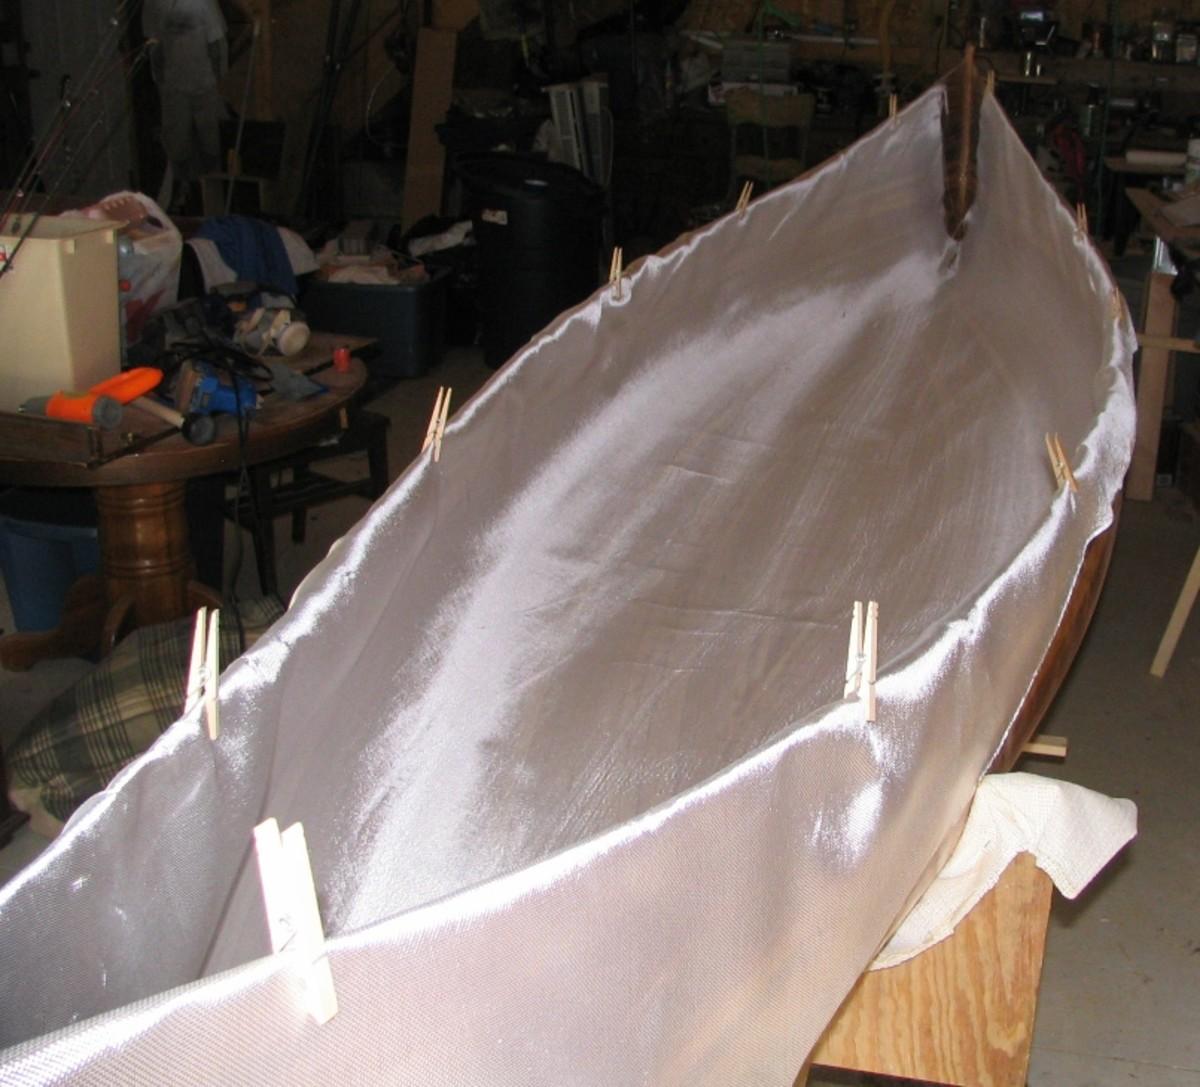 fiberglass cloth laid inside the hull